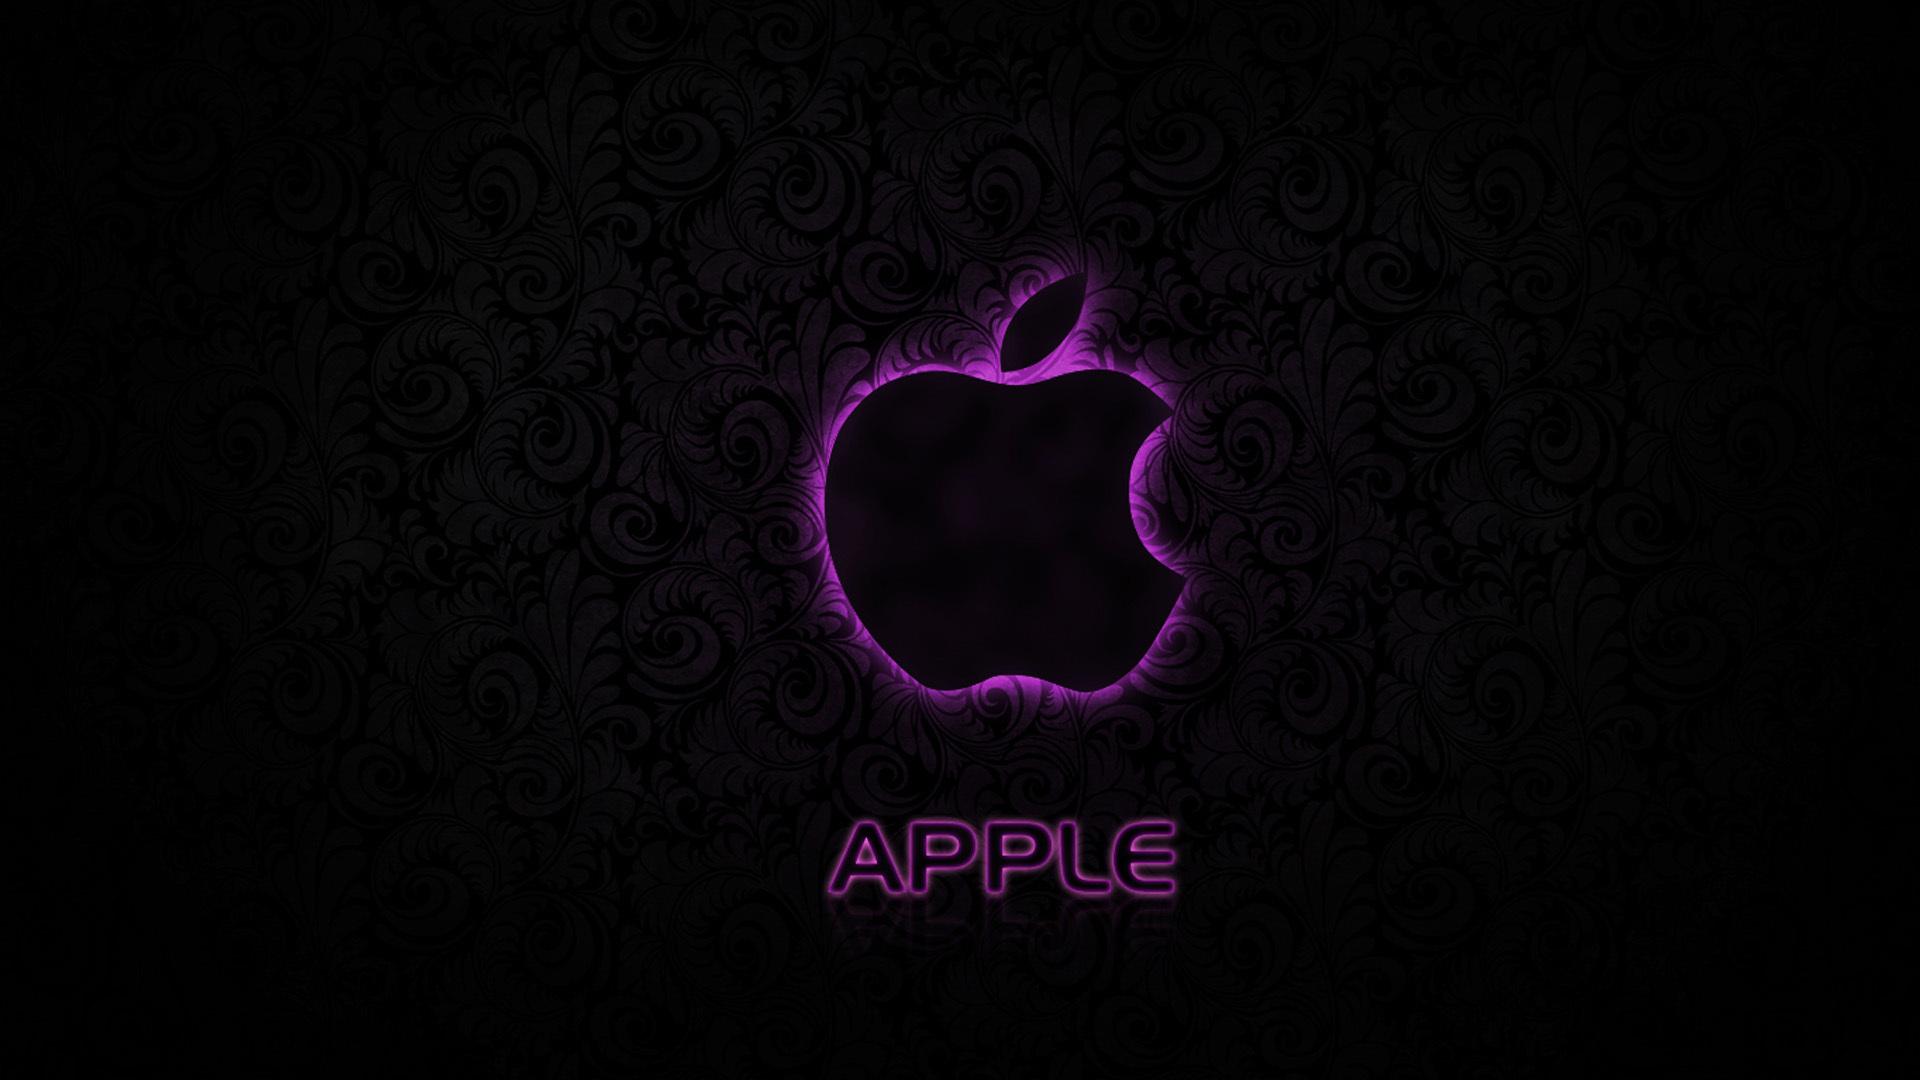 Обои На Телефон Логотип